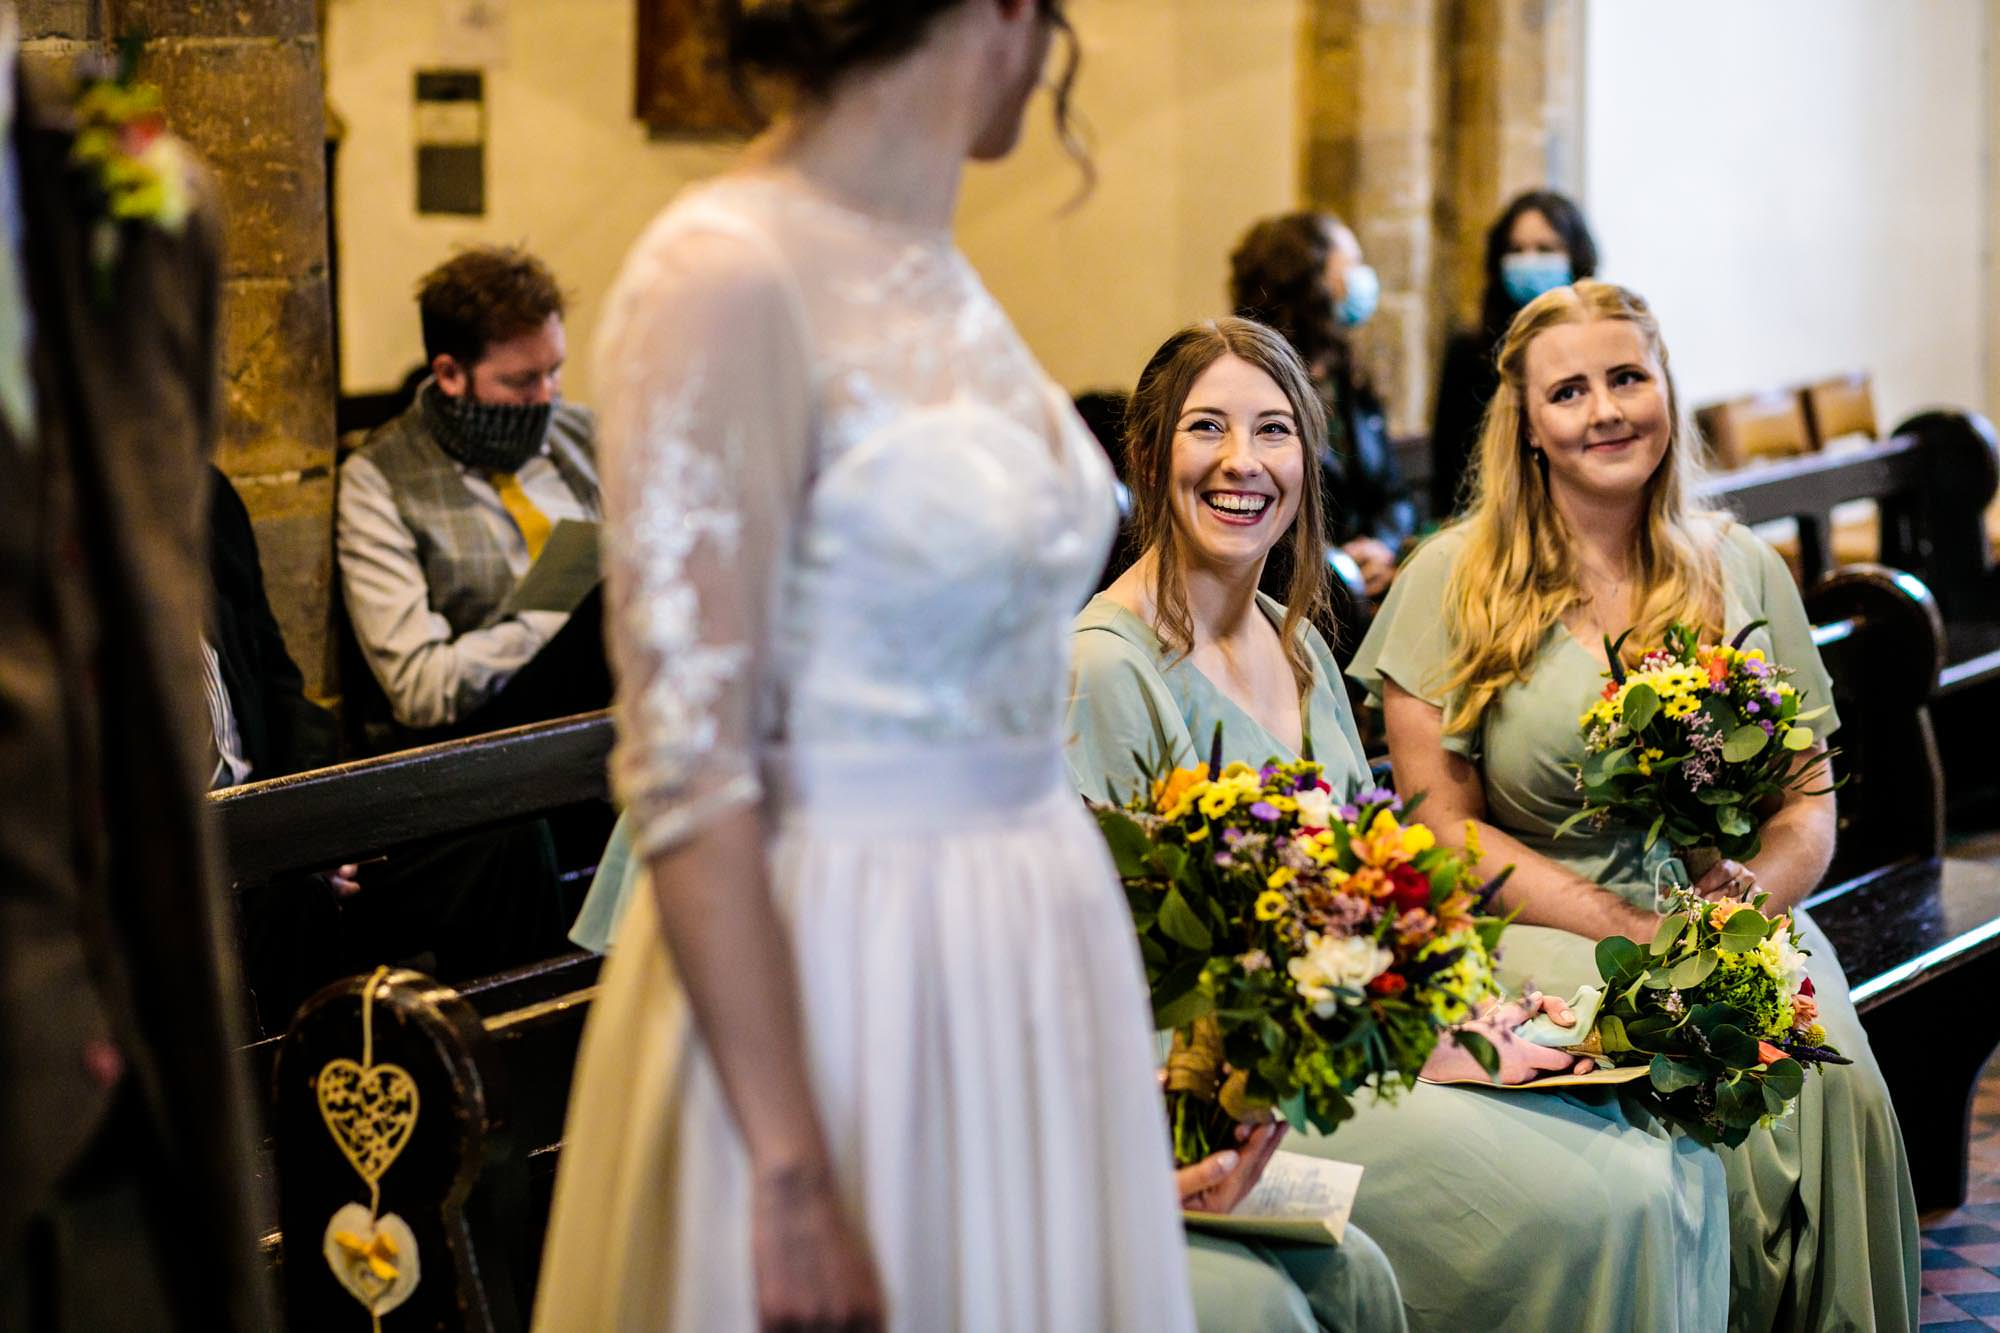 Bridesmaid smiling at bride in church